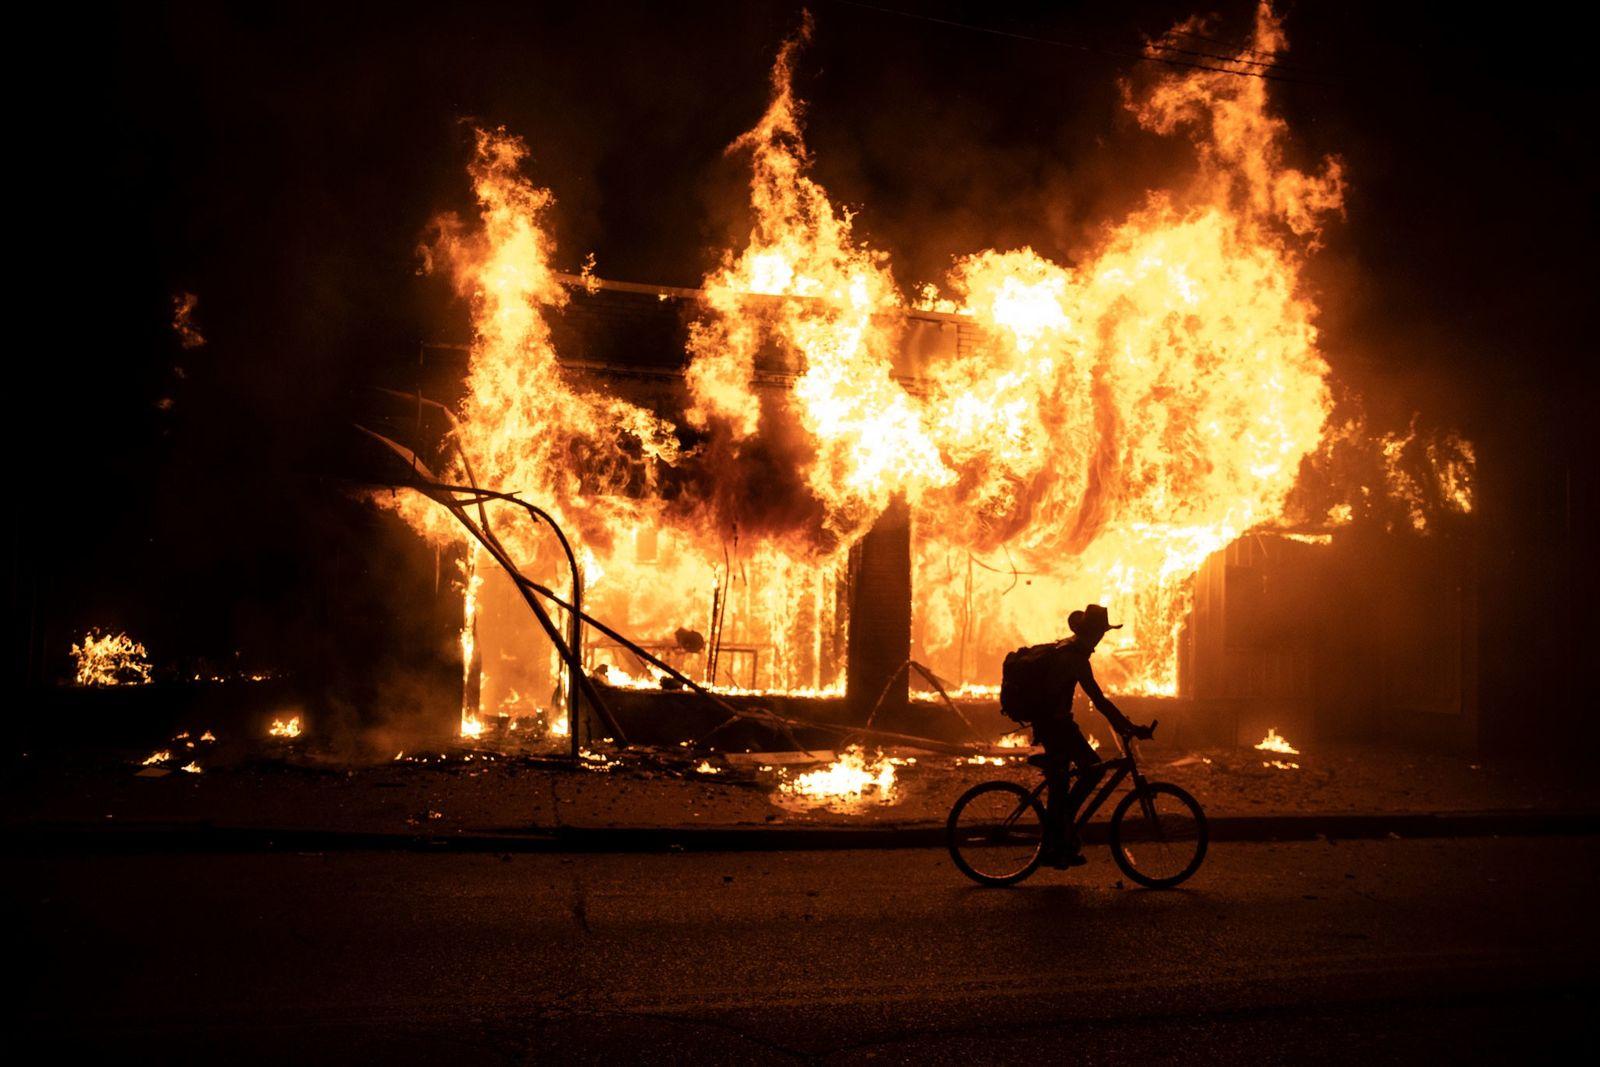 Un manifestante en bicicleta